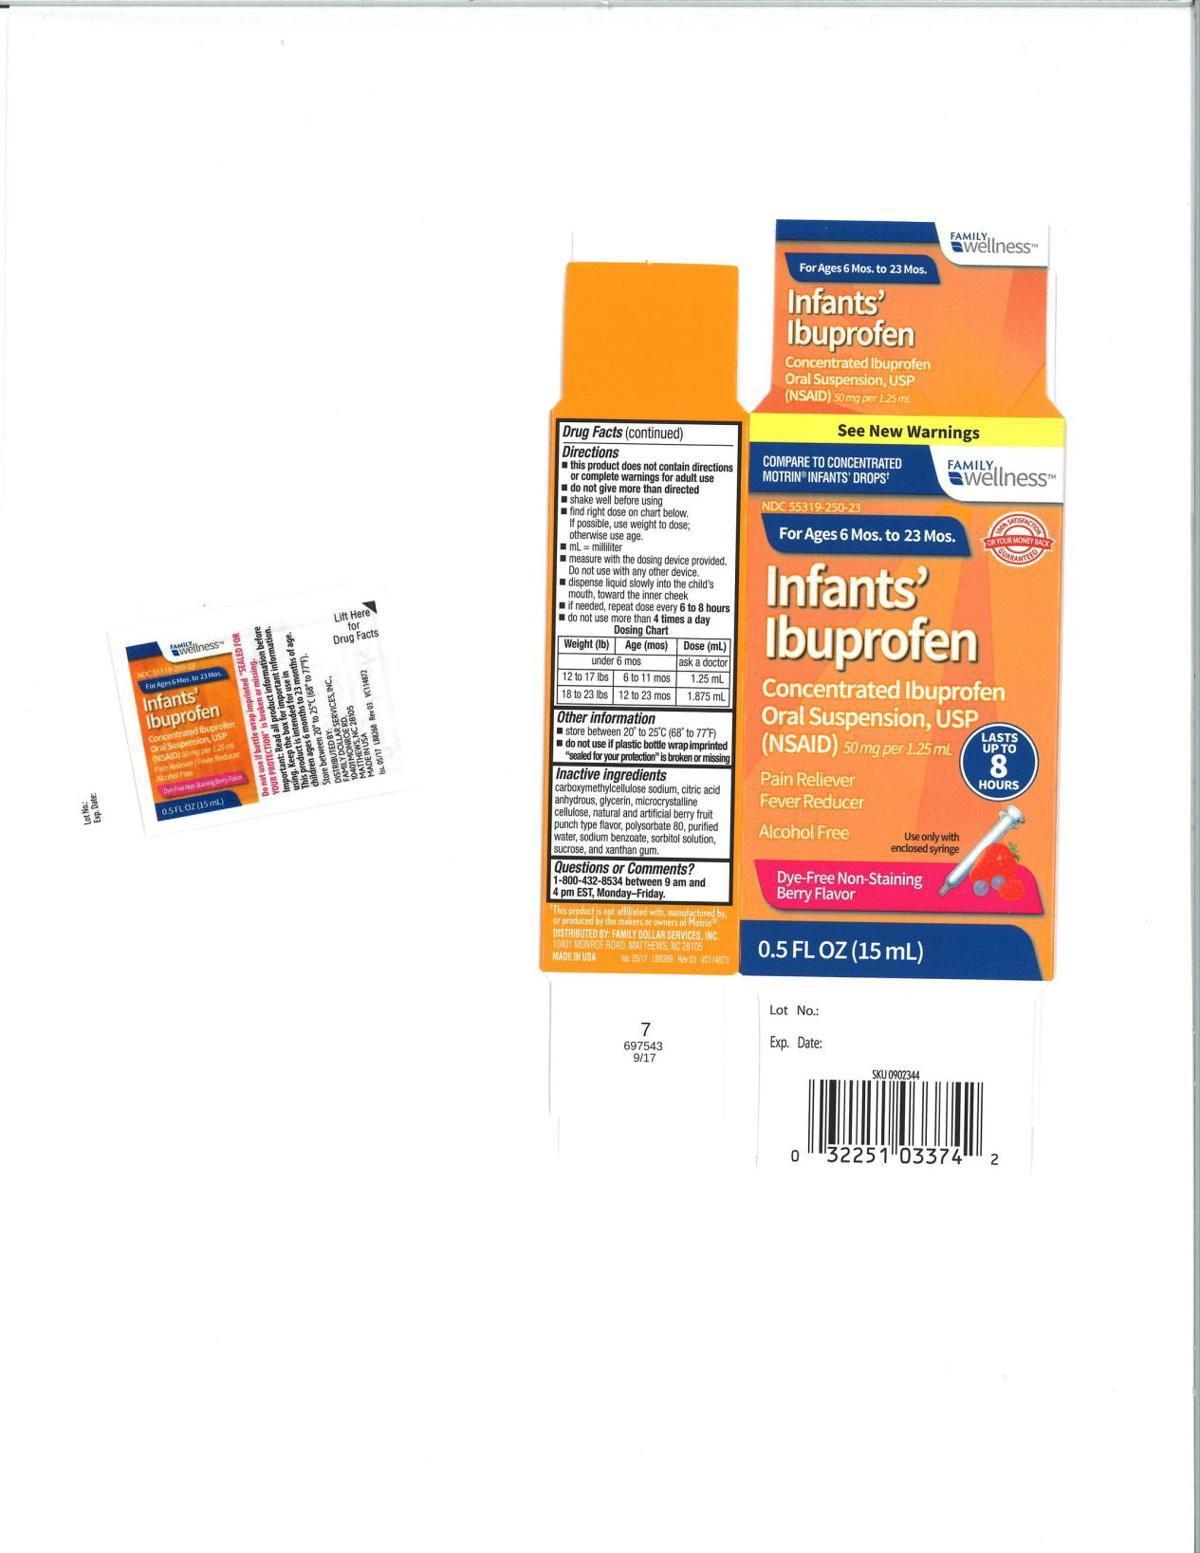 Recalled Ibuprofen - Family Wellness